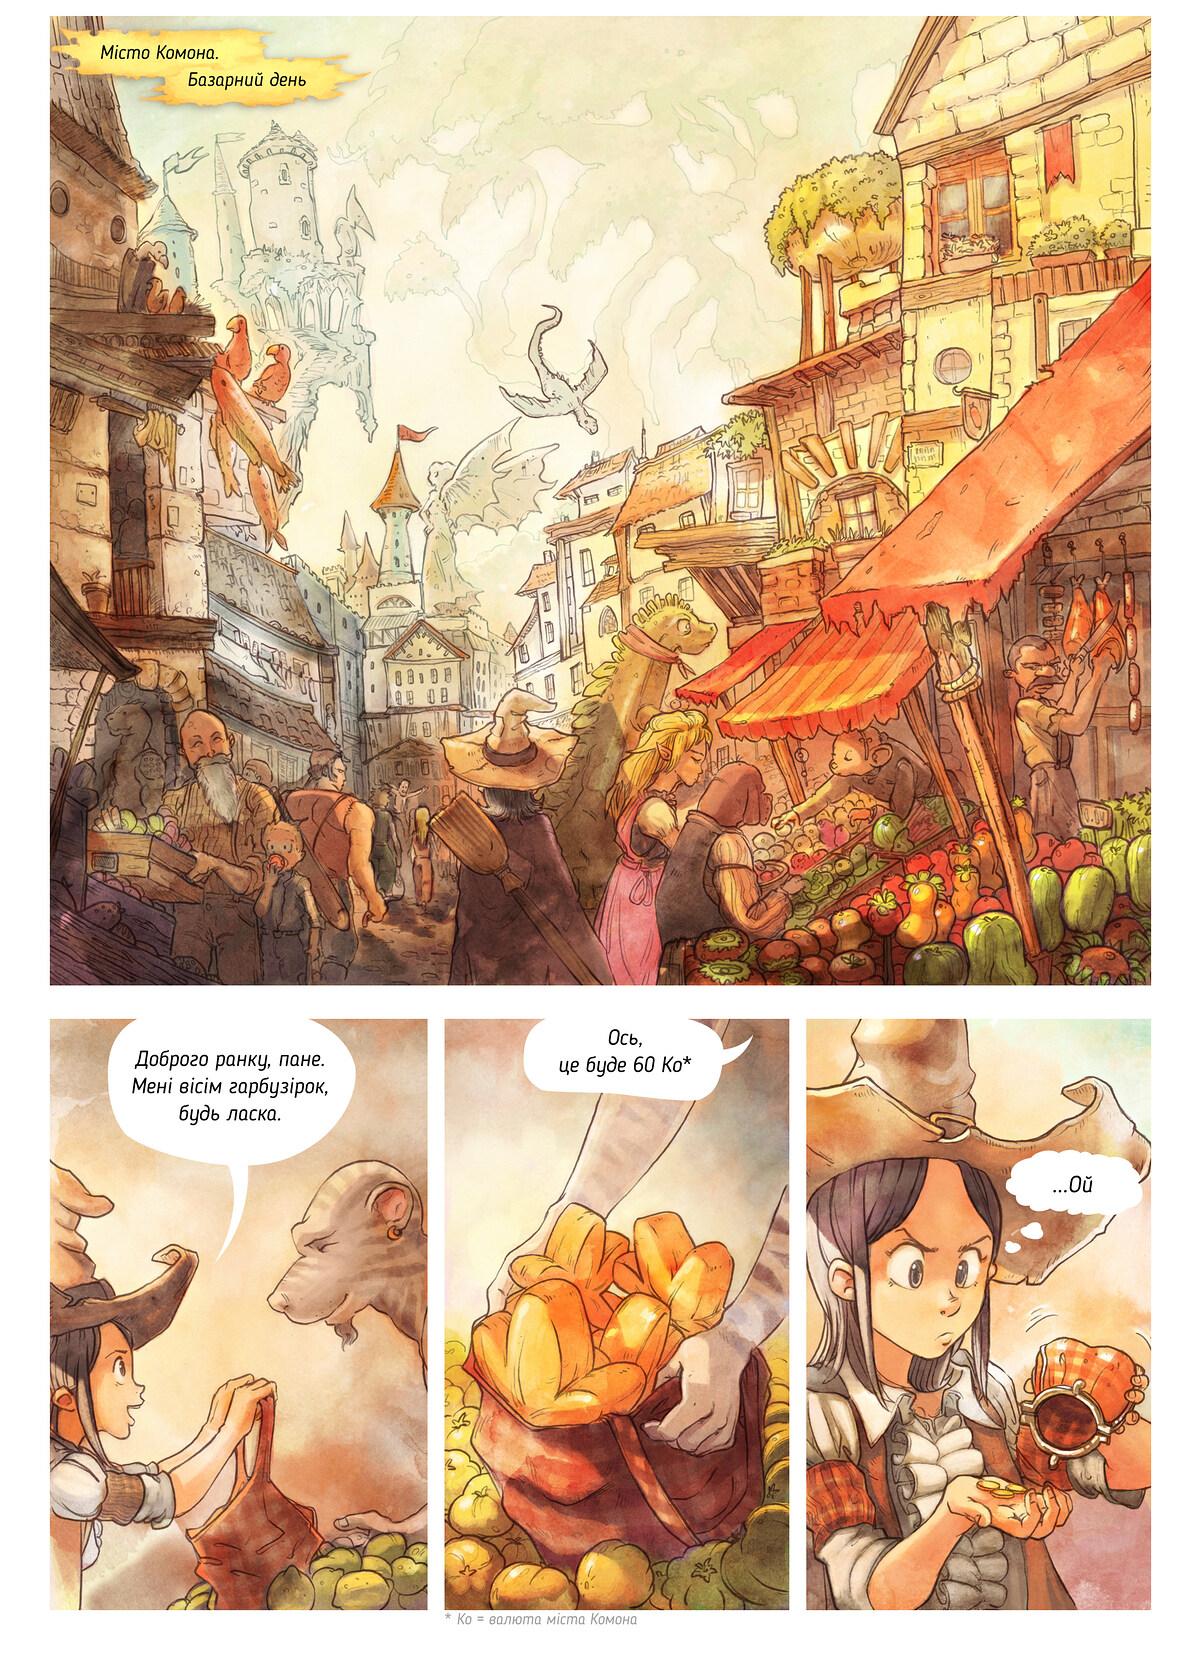 A webcomic page of Pepper&Carrot, епізод 3 [uk], стор. 1